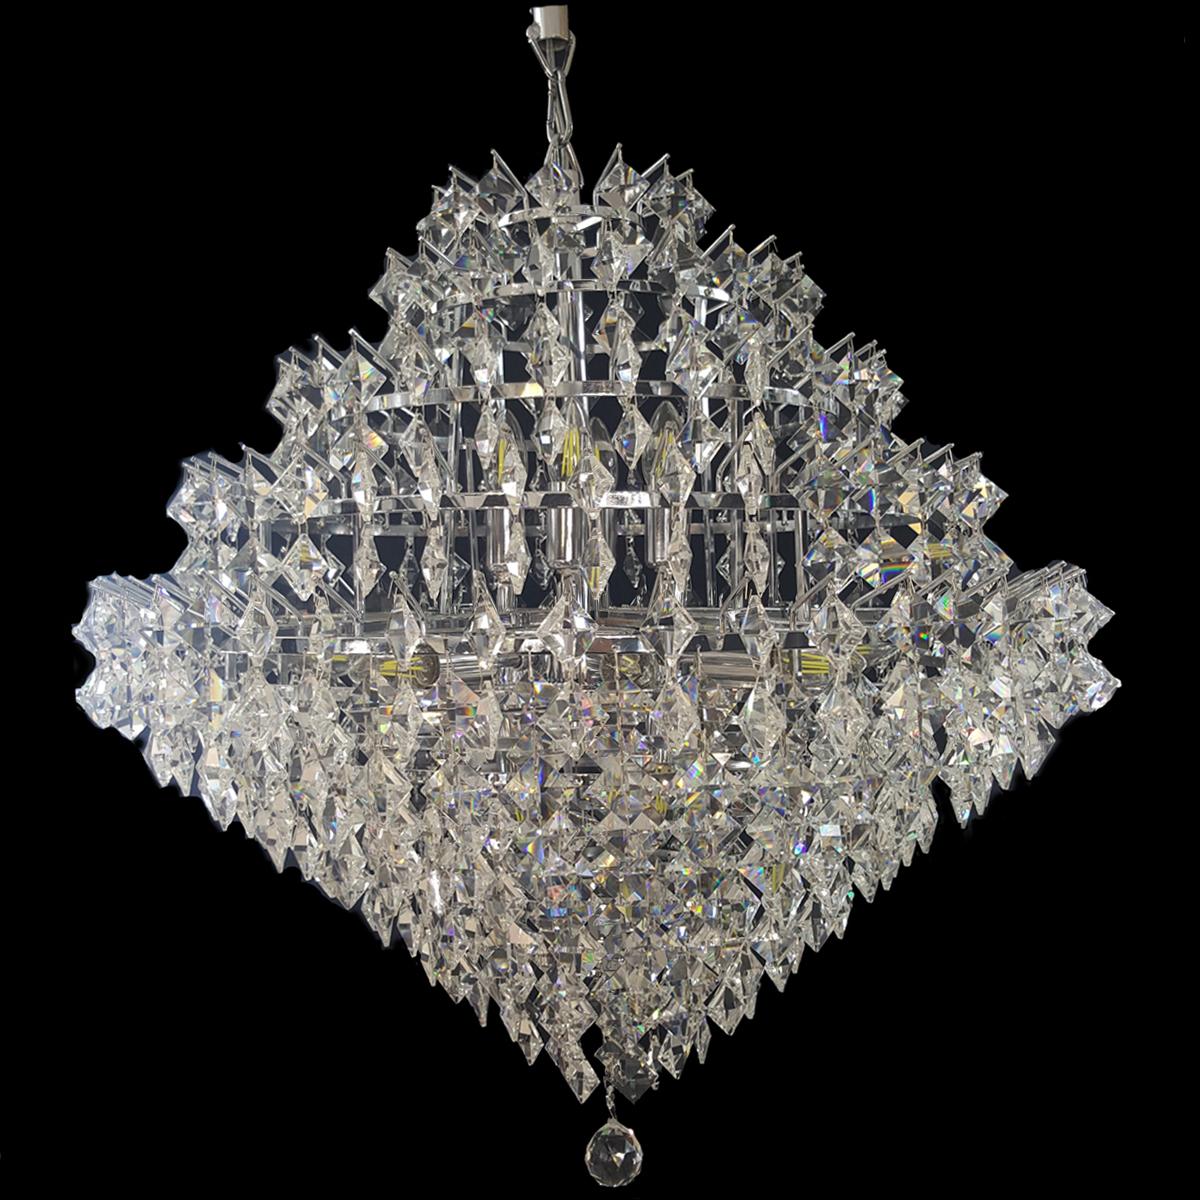 Diamante 690 Chrome Chandelier - CRPDIA14690CH